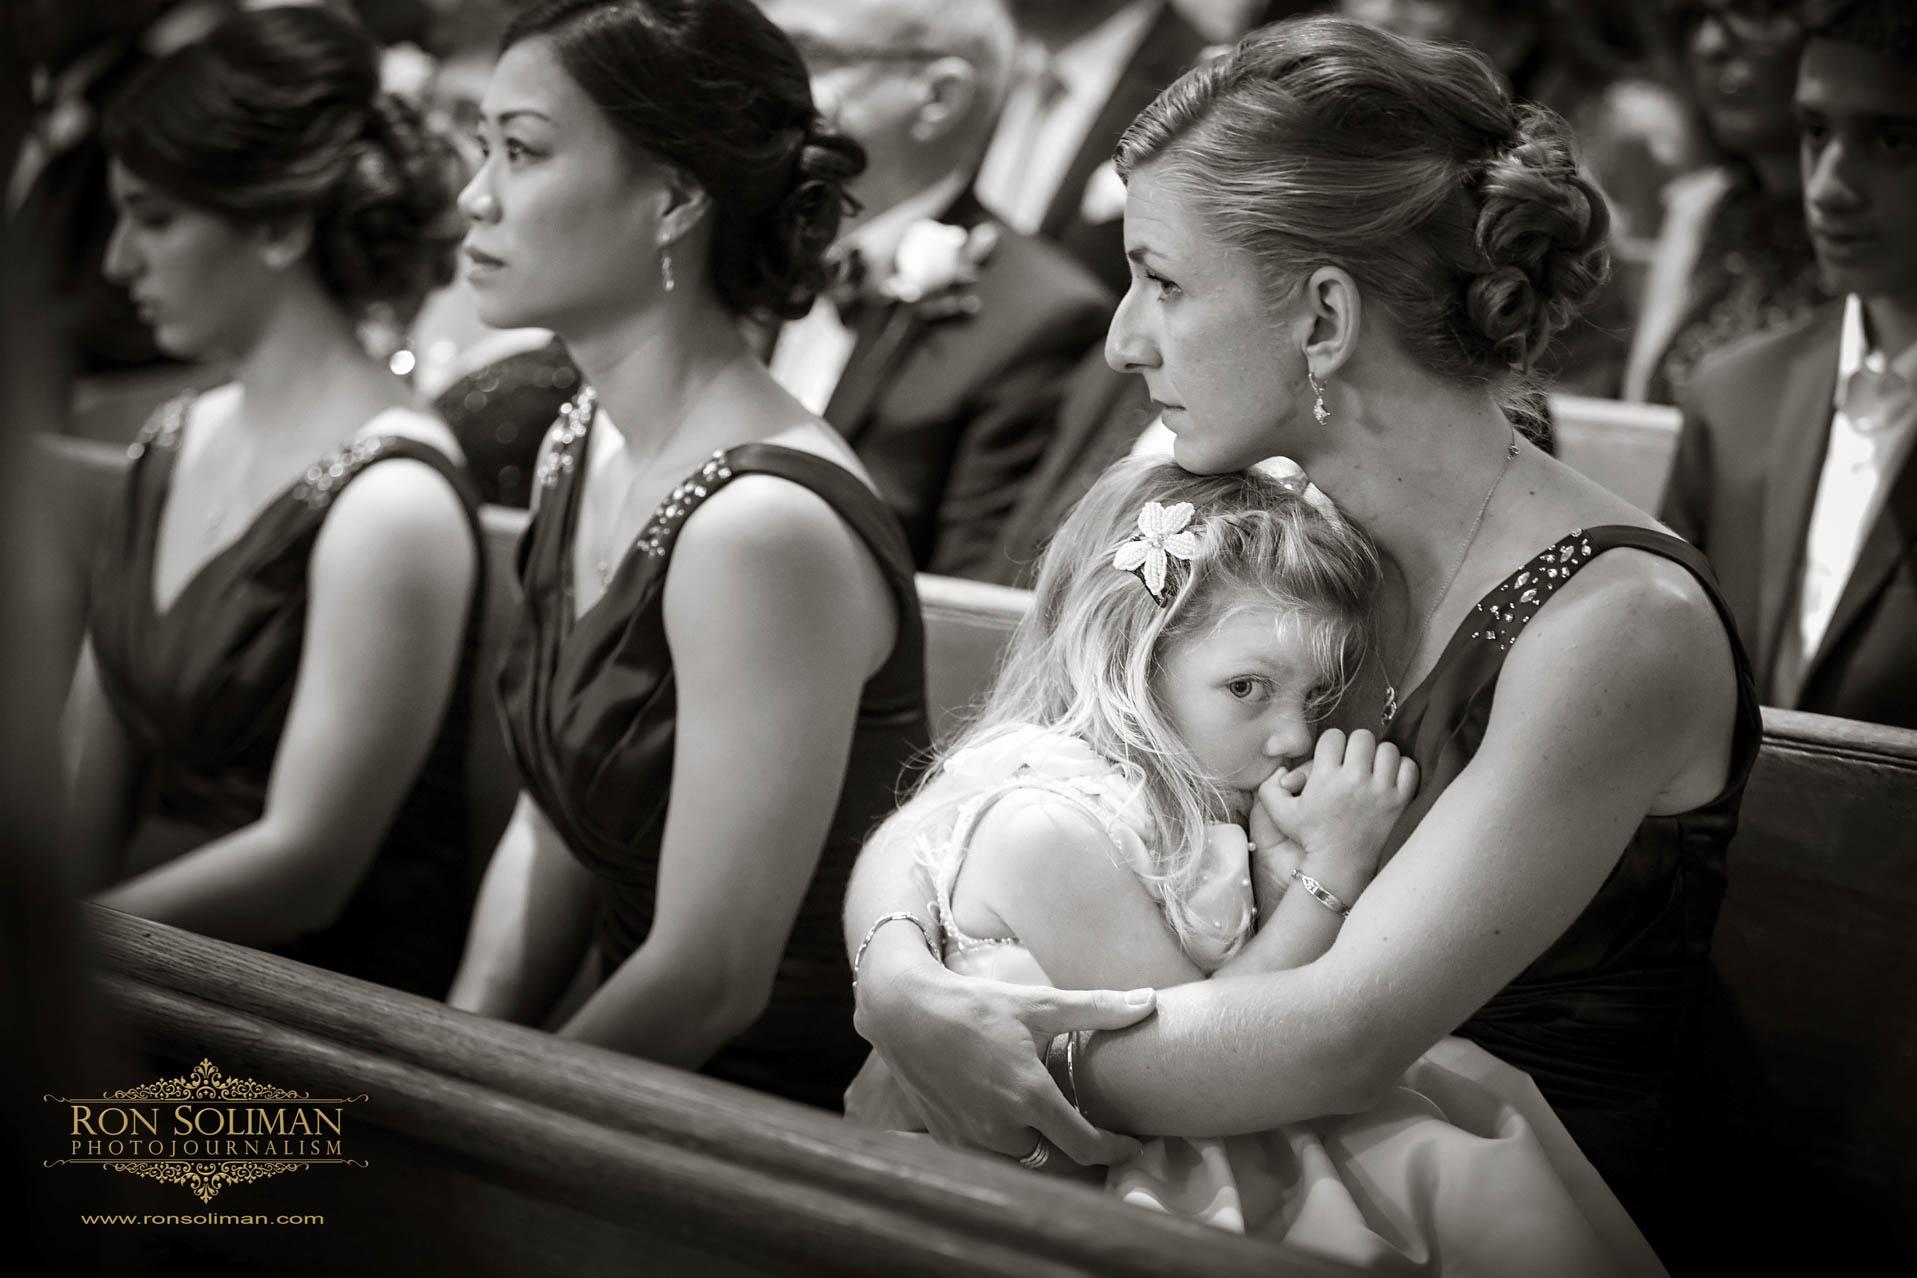 Immaculate Concepcion WEDDING PHOTOS at Bridgeton, NJ